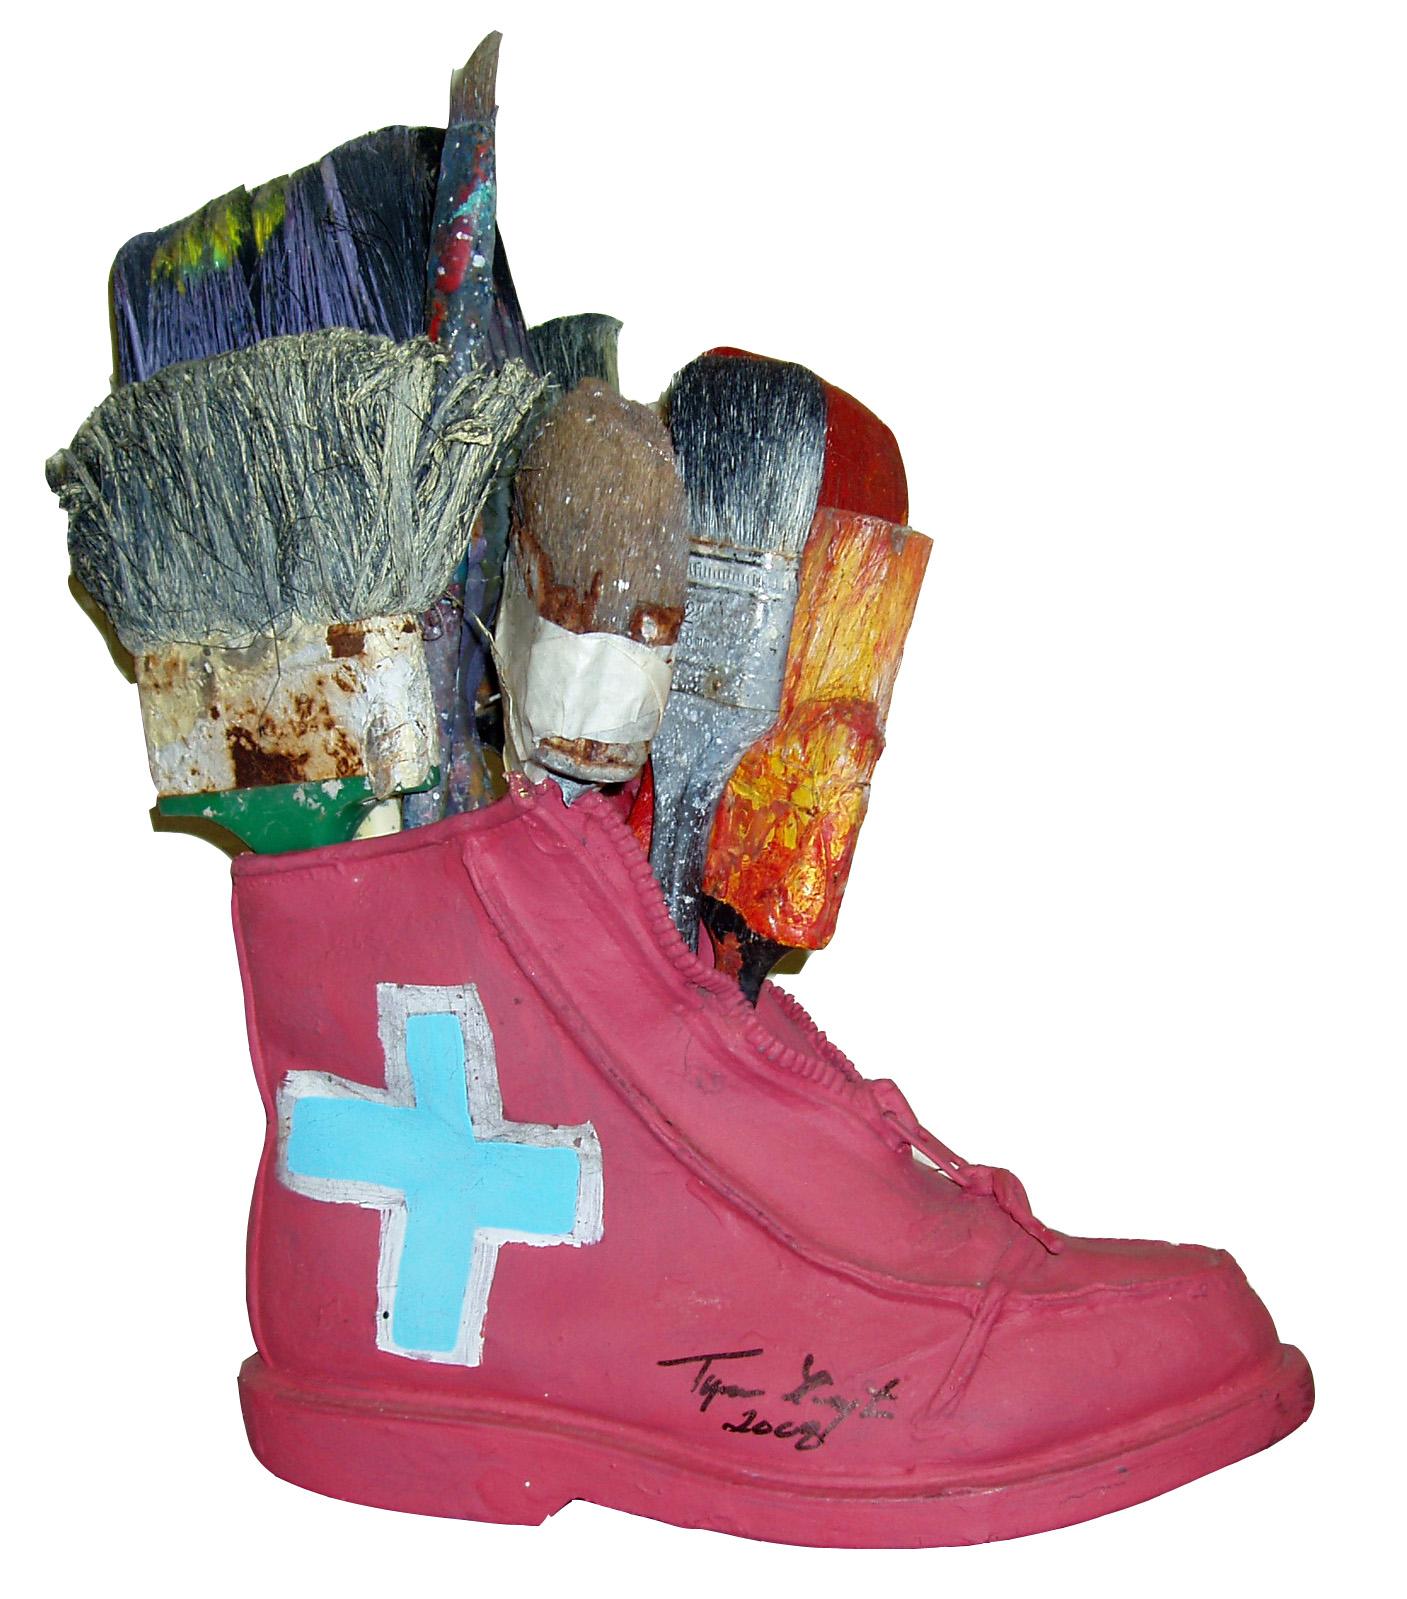 2 Tyree Boot .jpg